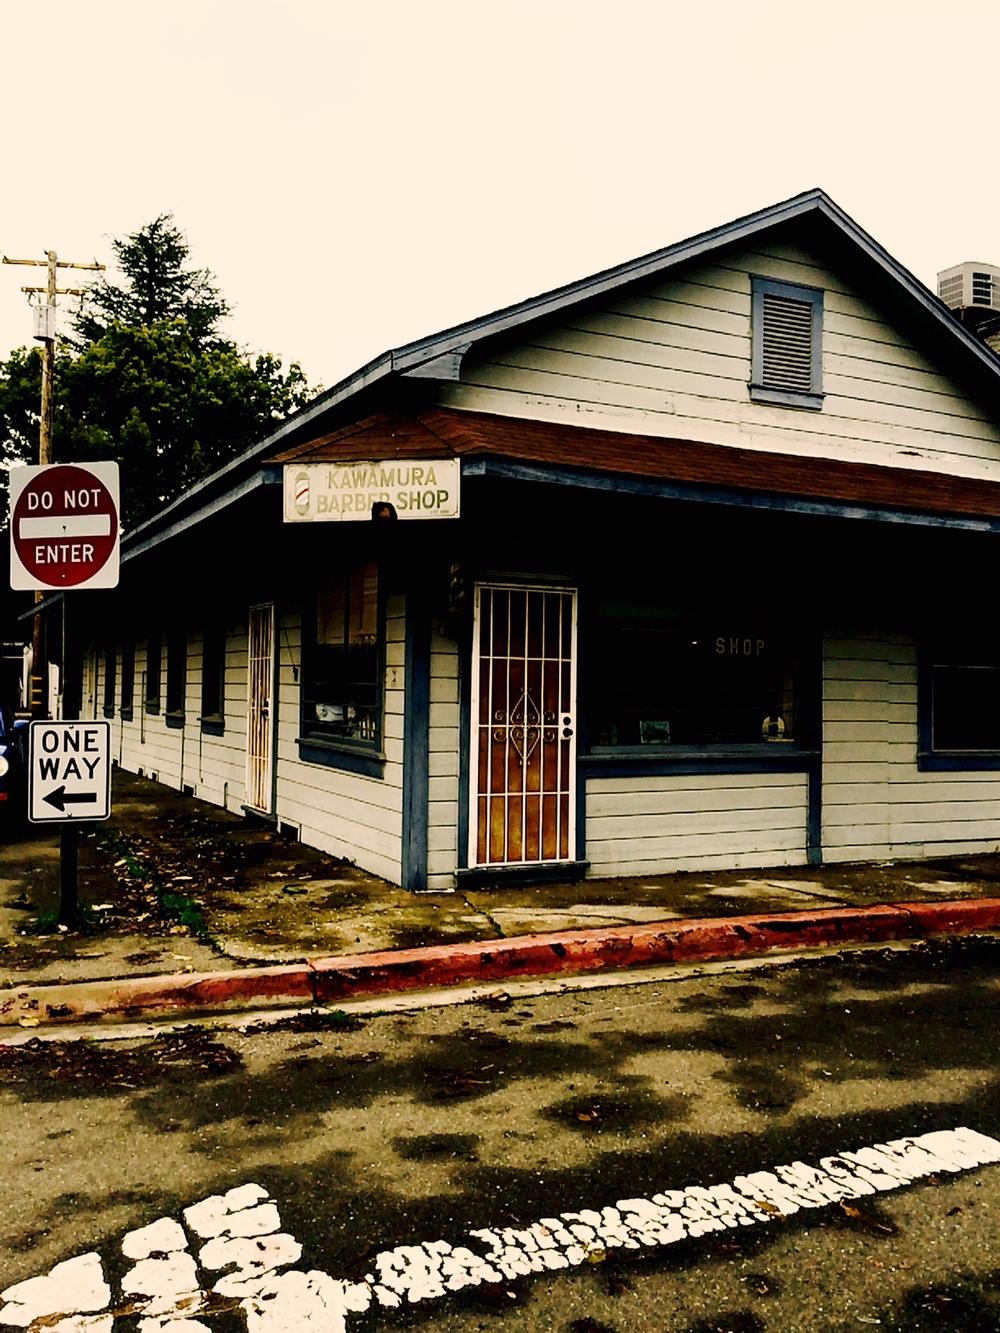 Kawamura Barber Shop